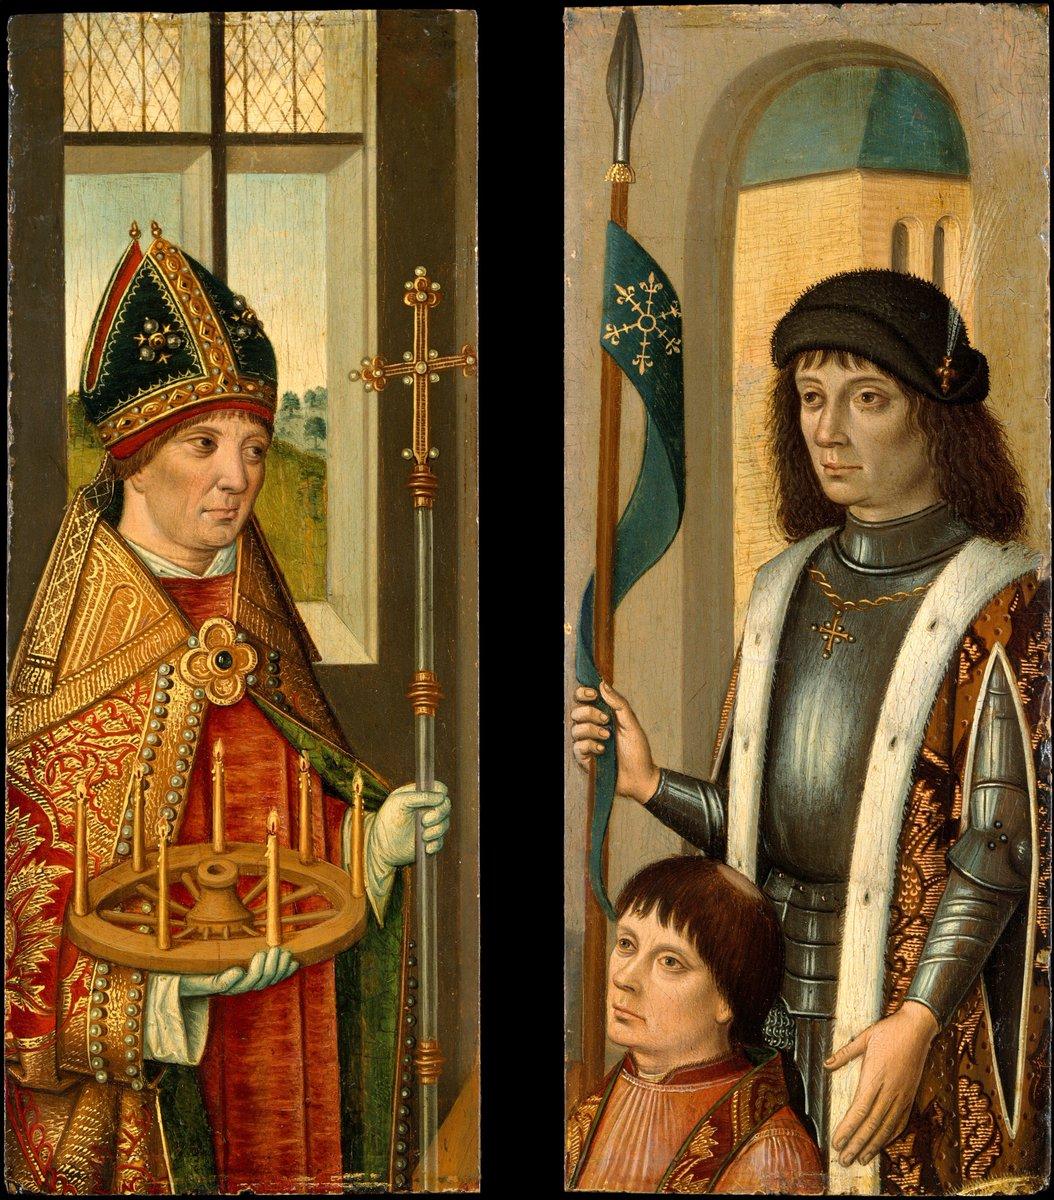 Saint Donatian; Saint Victor Presenting a Donor - Netherlandish (Bruges) Painter, c. 1490. (Metropolitan Museum of Art)